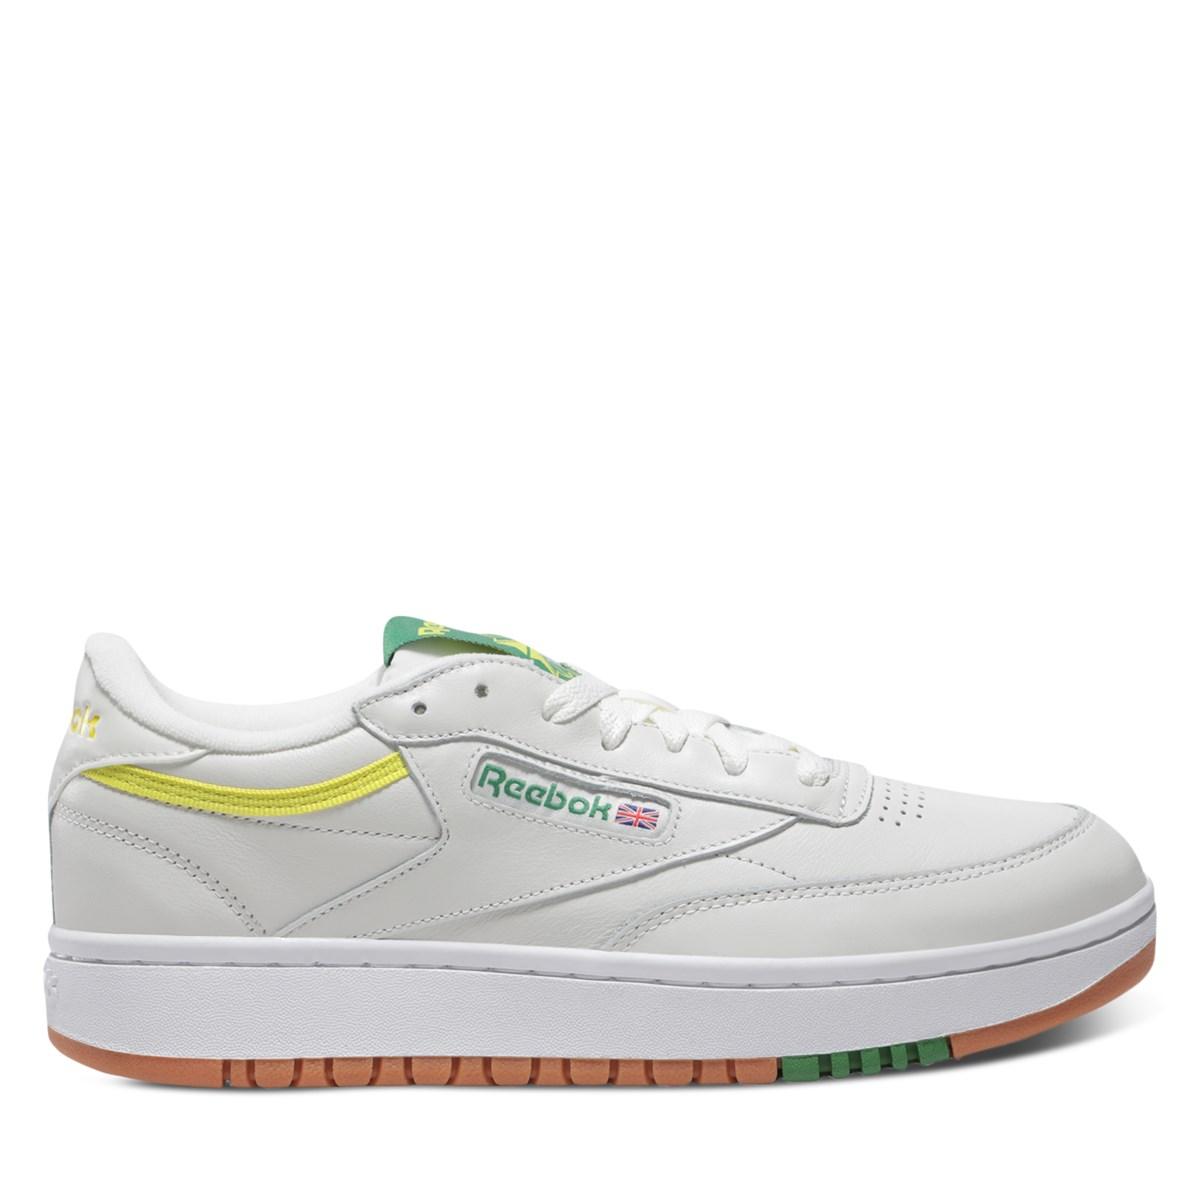 Women's Club C Double Sneakers in White/Green/Yellow